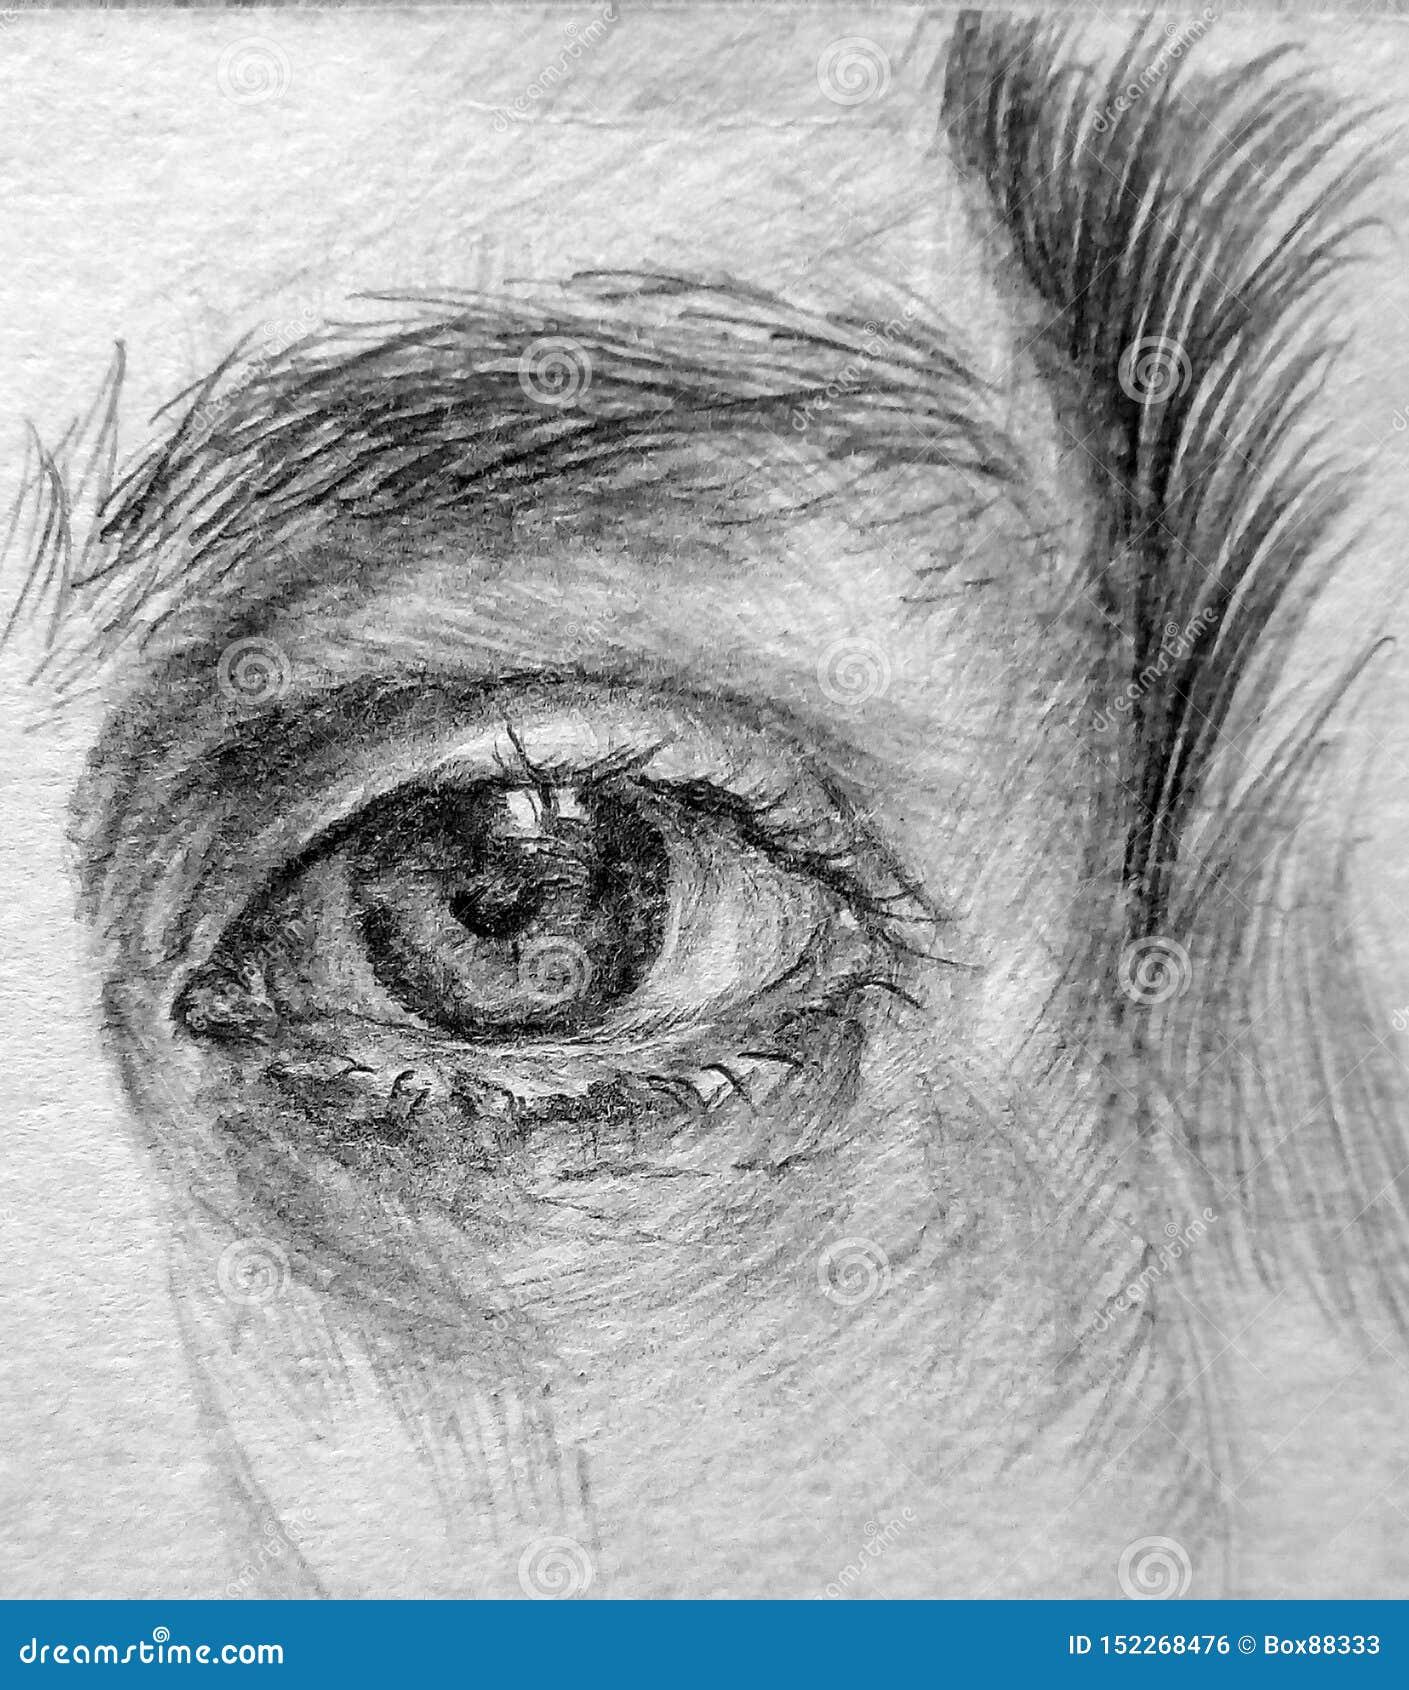 Imagen del primer del ojo humano